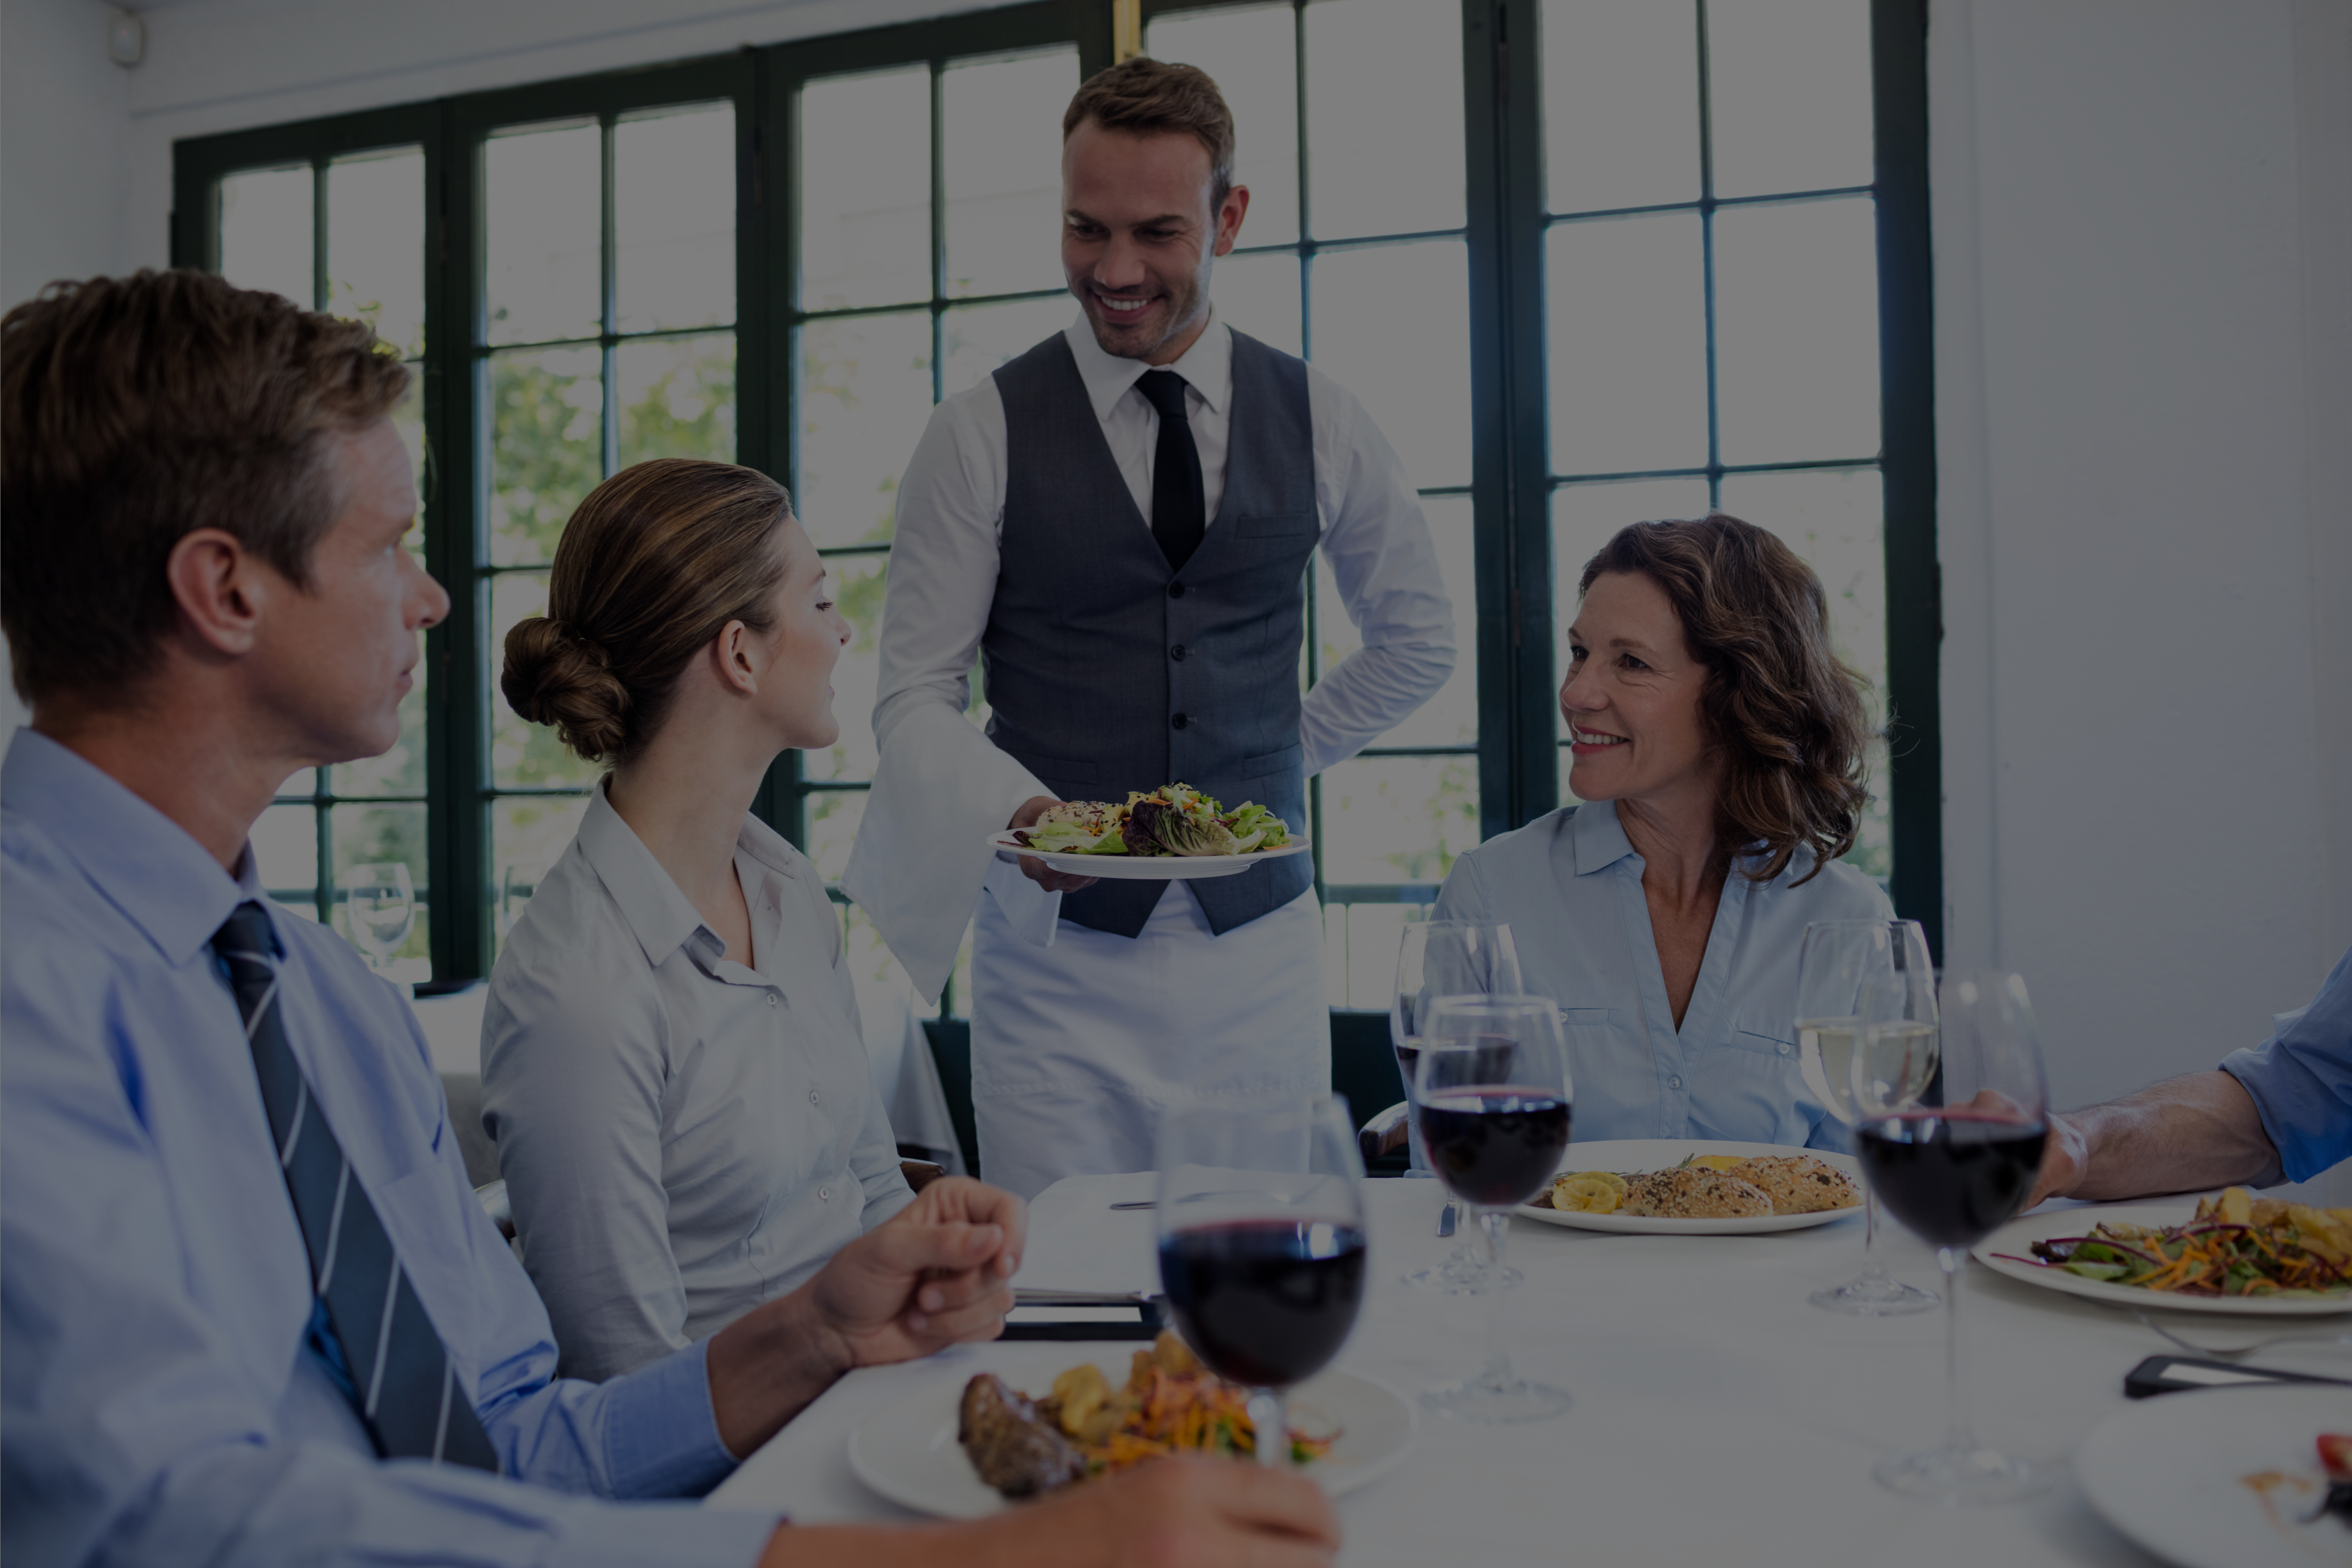 Food Safety Fuels Five-Star Customer Feedback